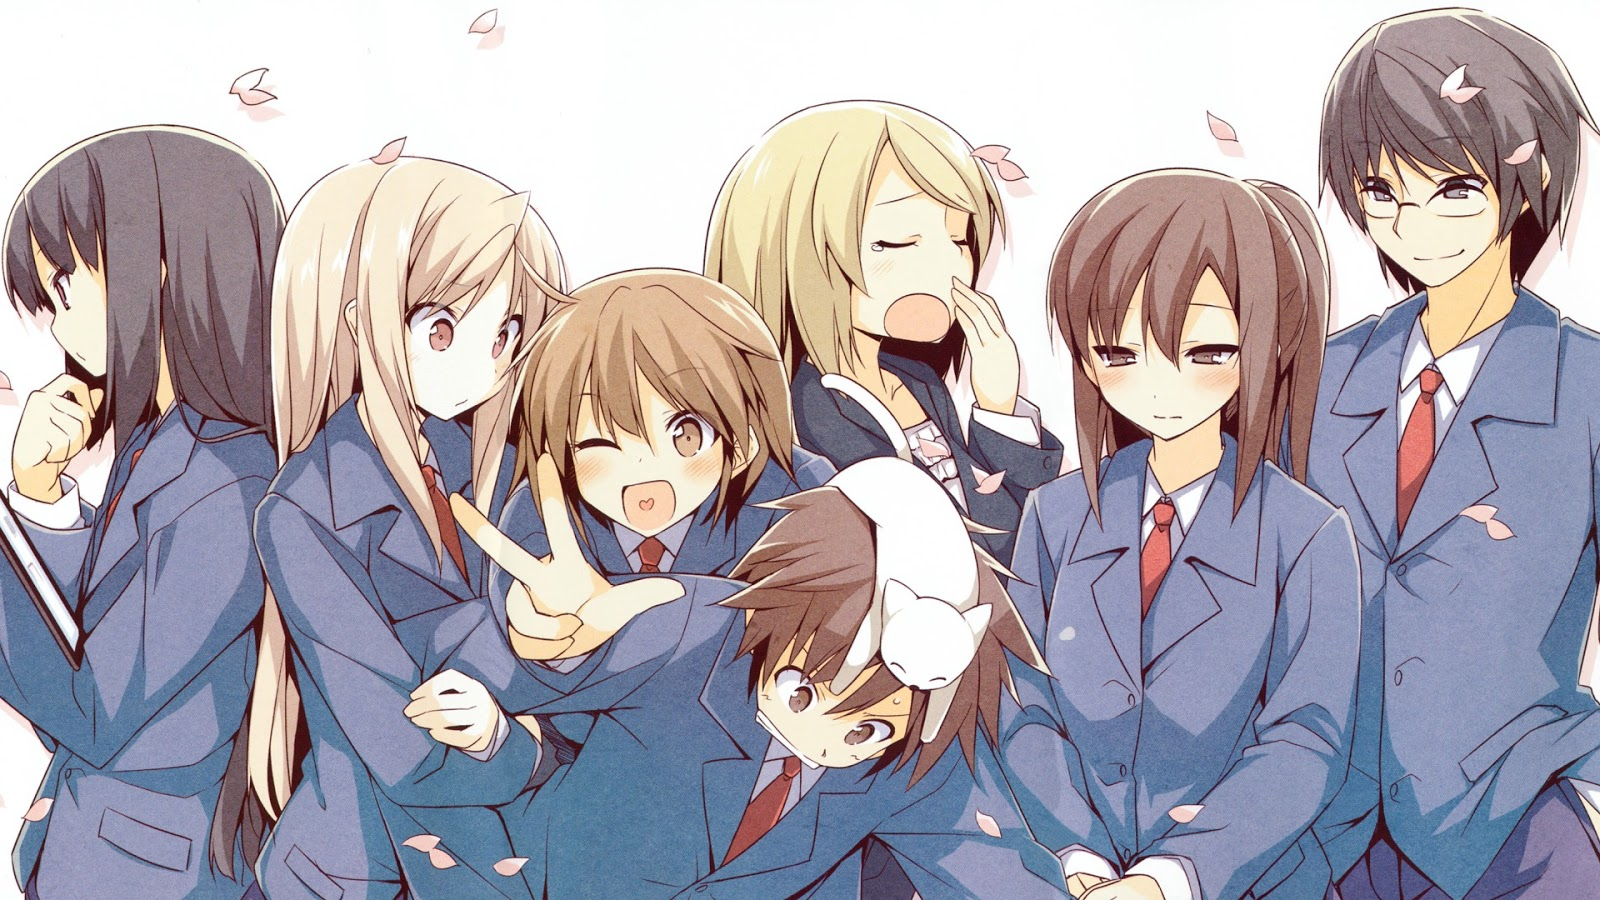 Rekomendasi Anime Yang Wajib Ditonton Nemobee